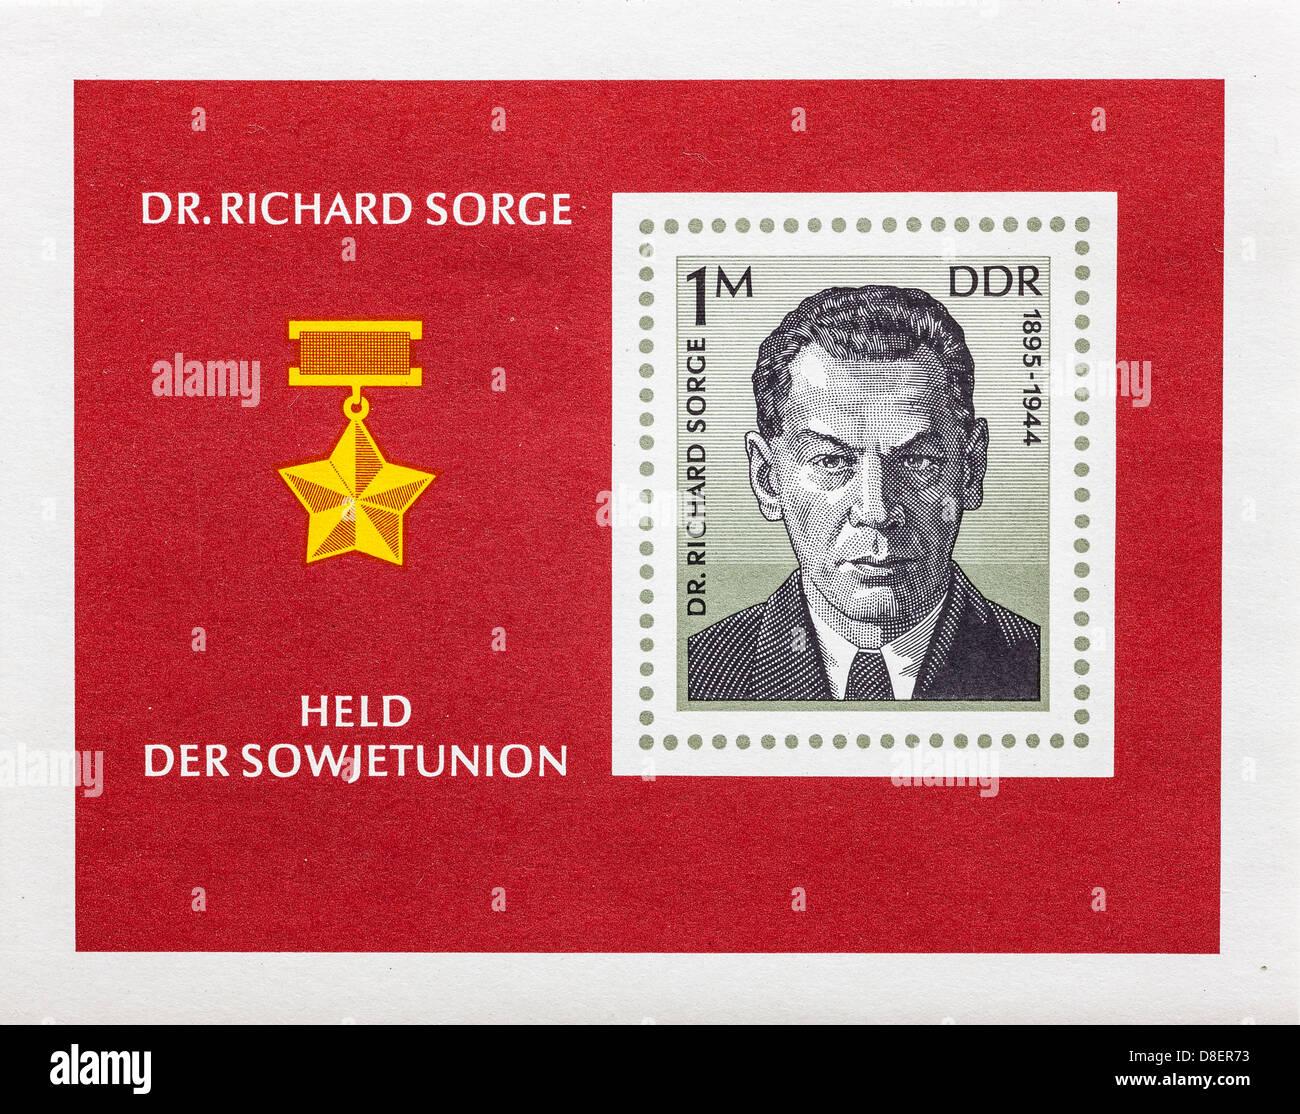 soviet-spy-richard-sorge-featured-on-a-c